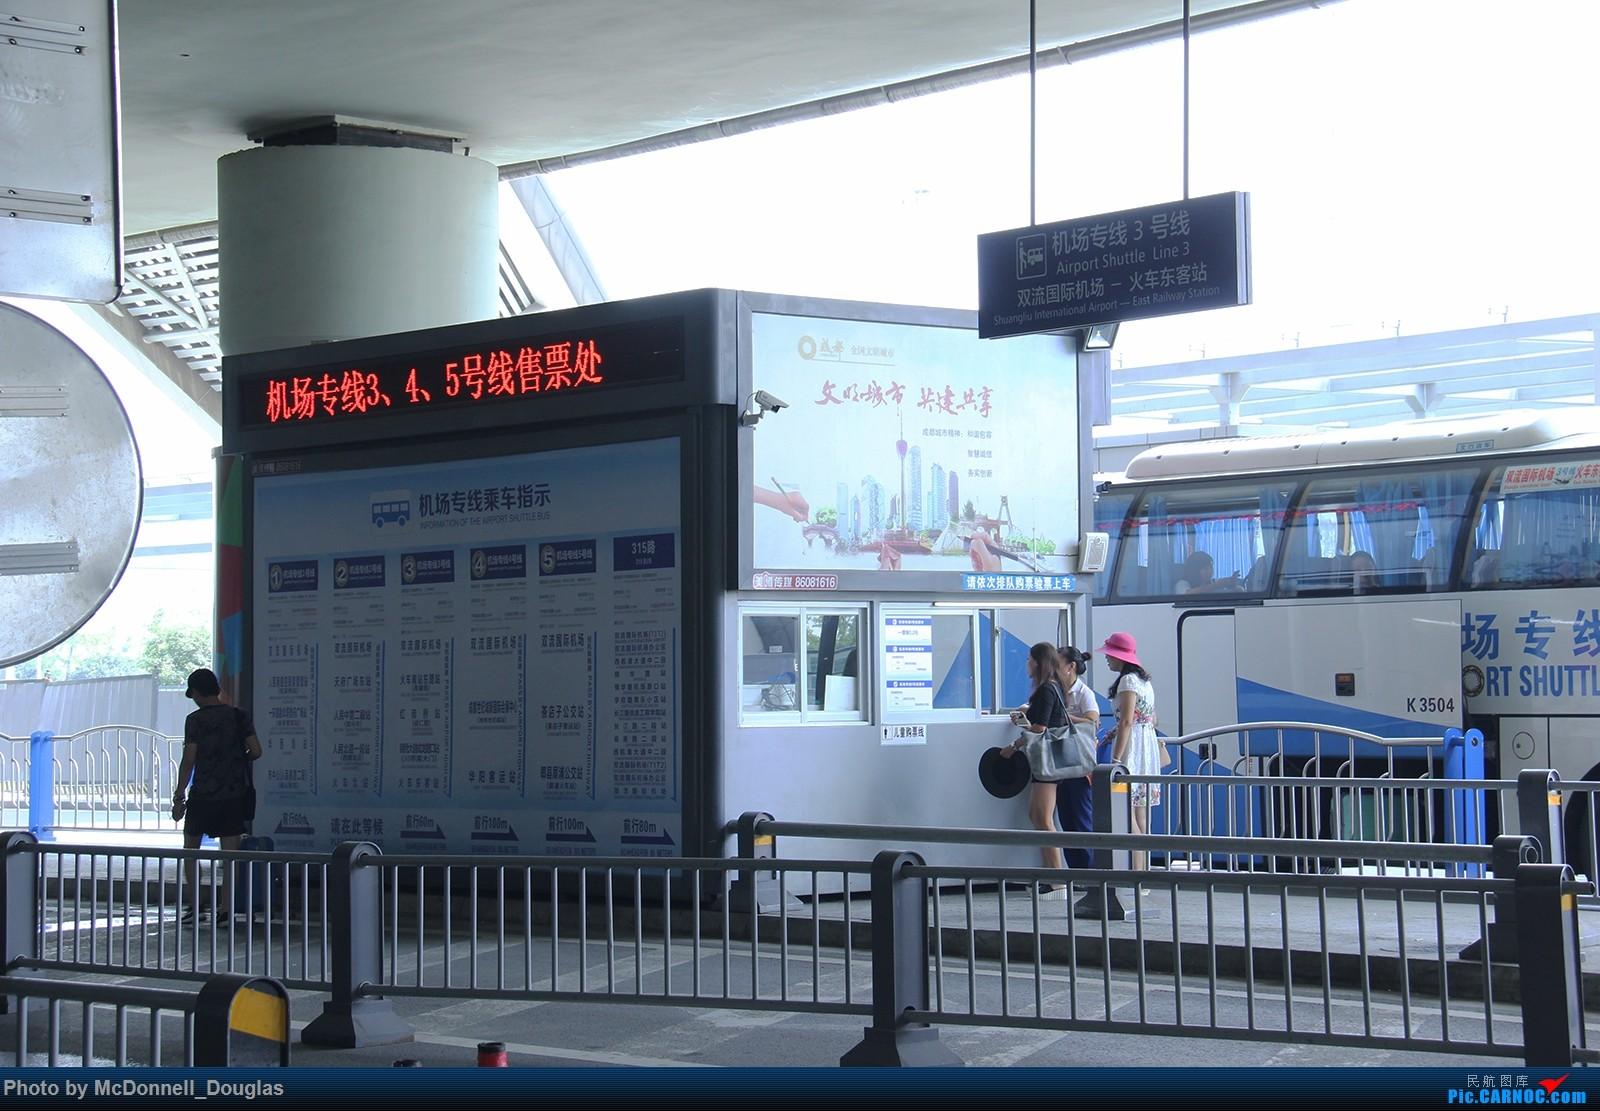 Re:[原创]【上海飞友会】【zc带你走天下(3)】再访祖辈年轻时工作的土地,父母年少时生活戈壁,跨越大半个中国去看新疆,回程小游蓉城(下) BOEING 737-81B B-7971 中国成都双流国际机场